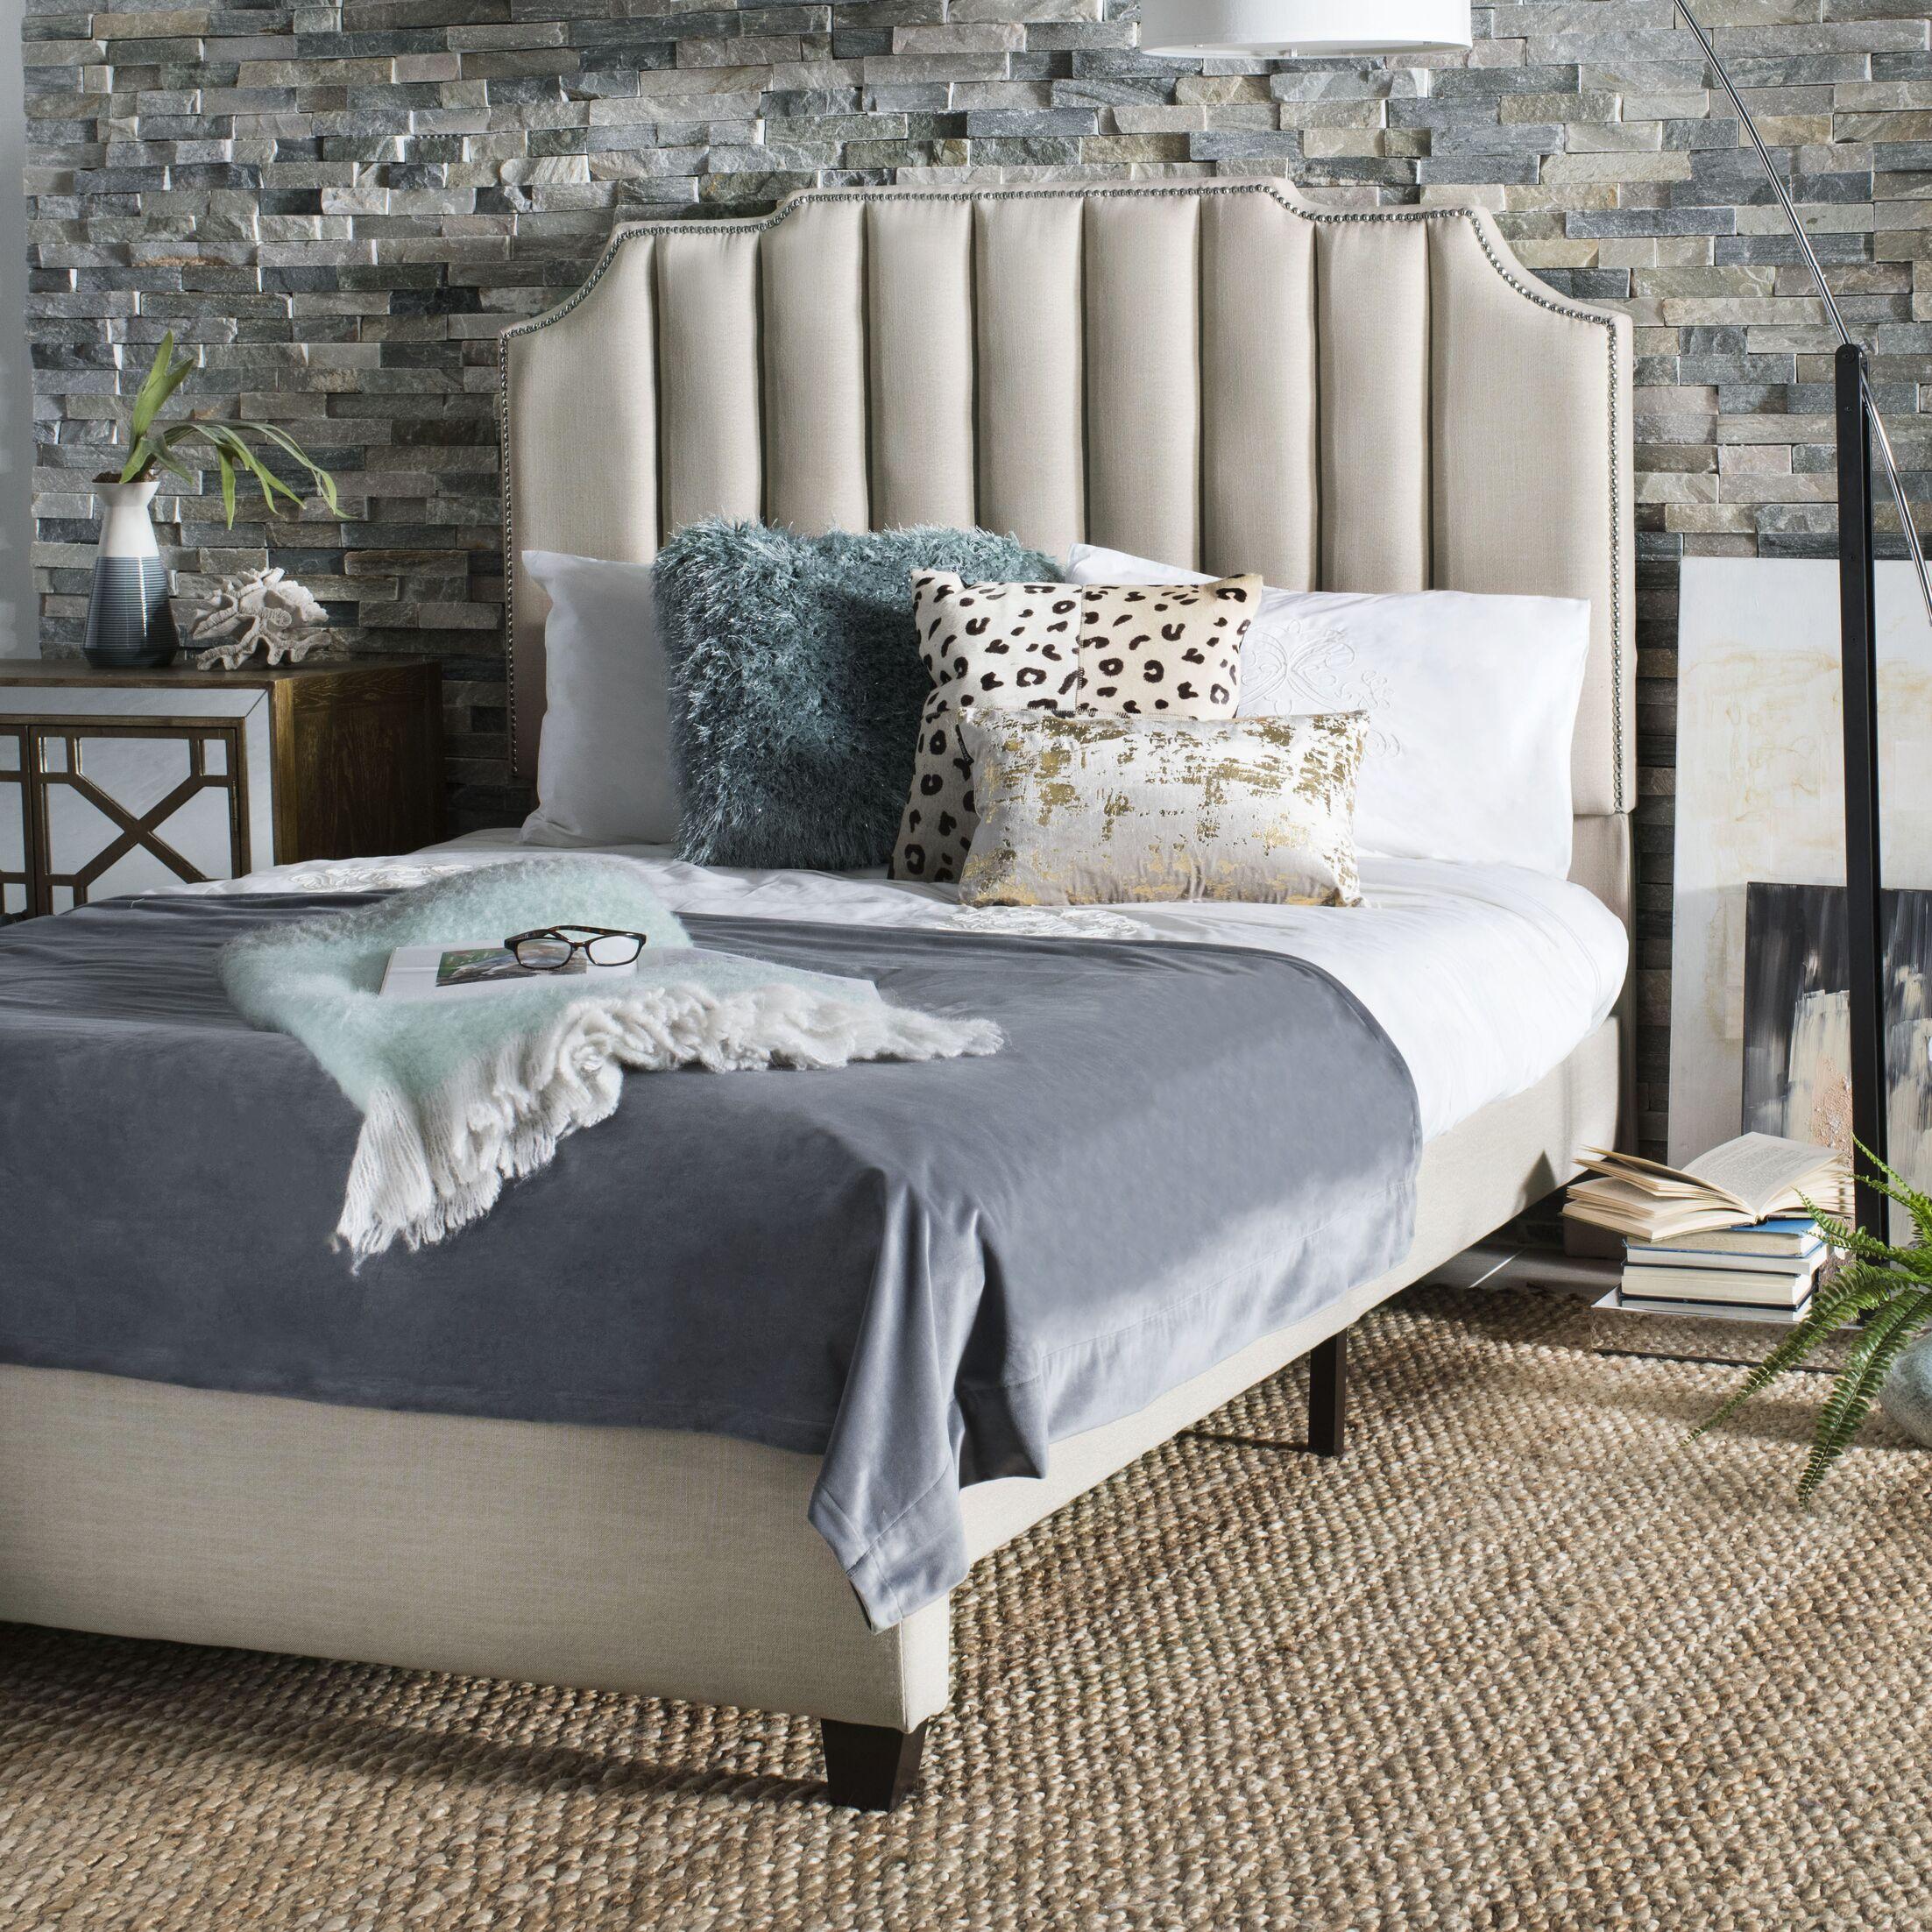 Musgrave Upholstered Panel Bed Color: Beige, Size: Full